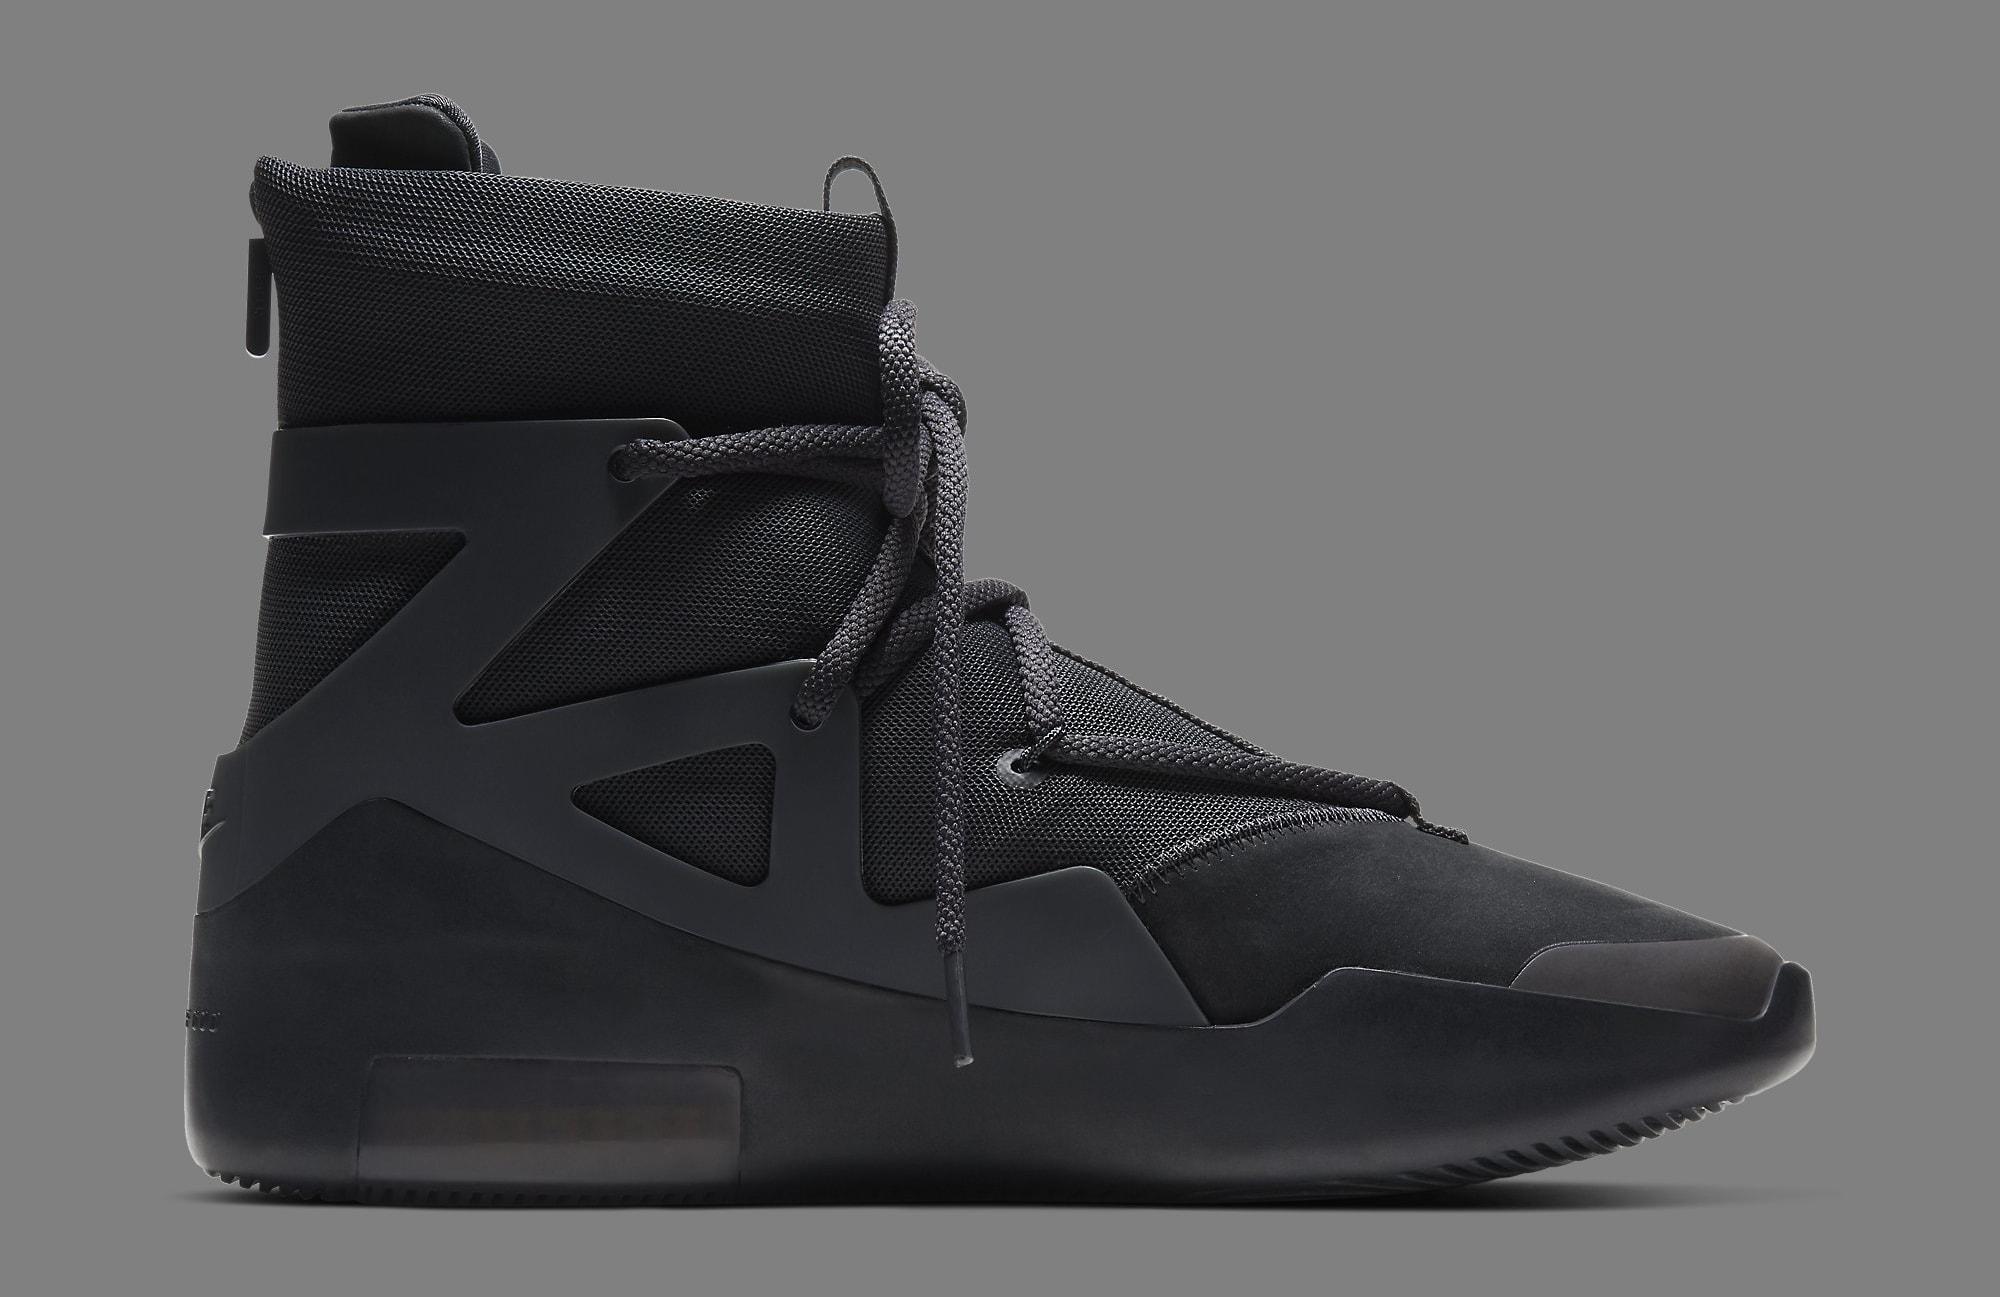 Nike Air Fear of God 1 'Triple Black' AR4237-005 Medial